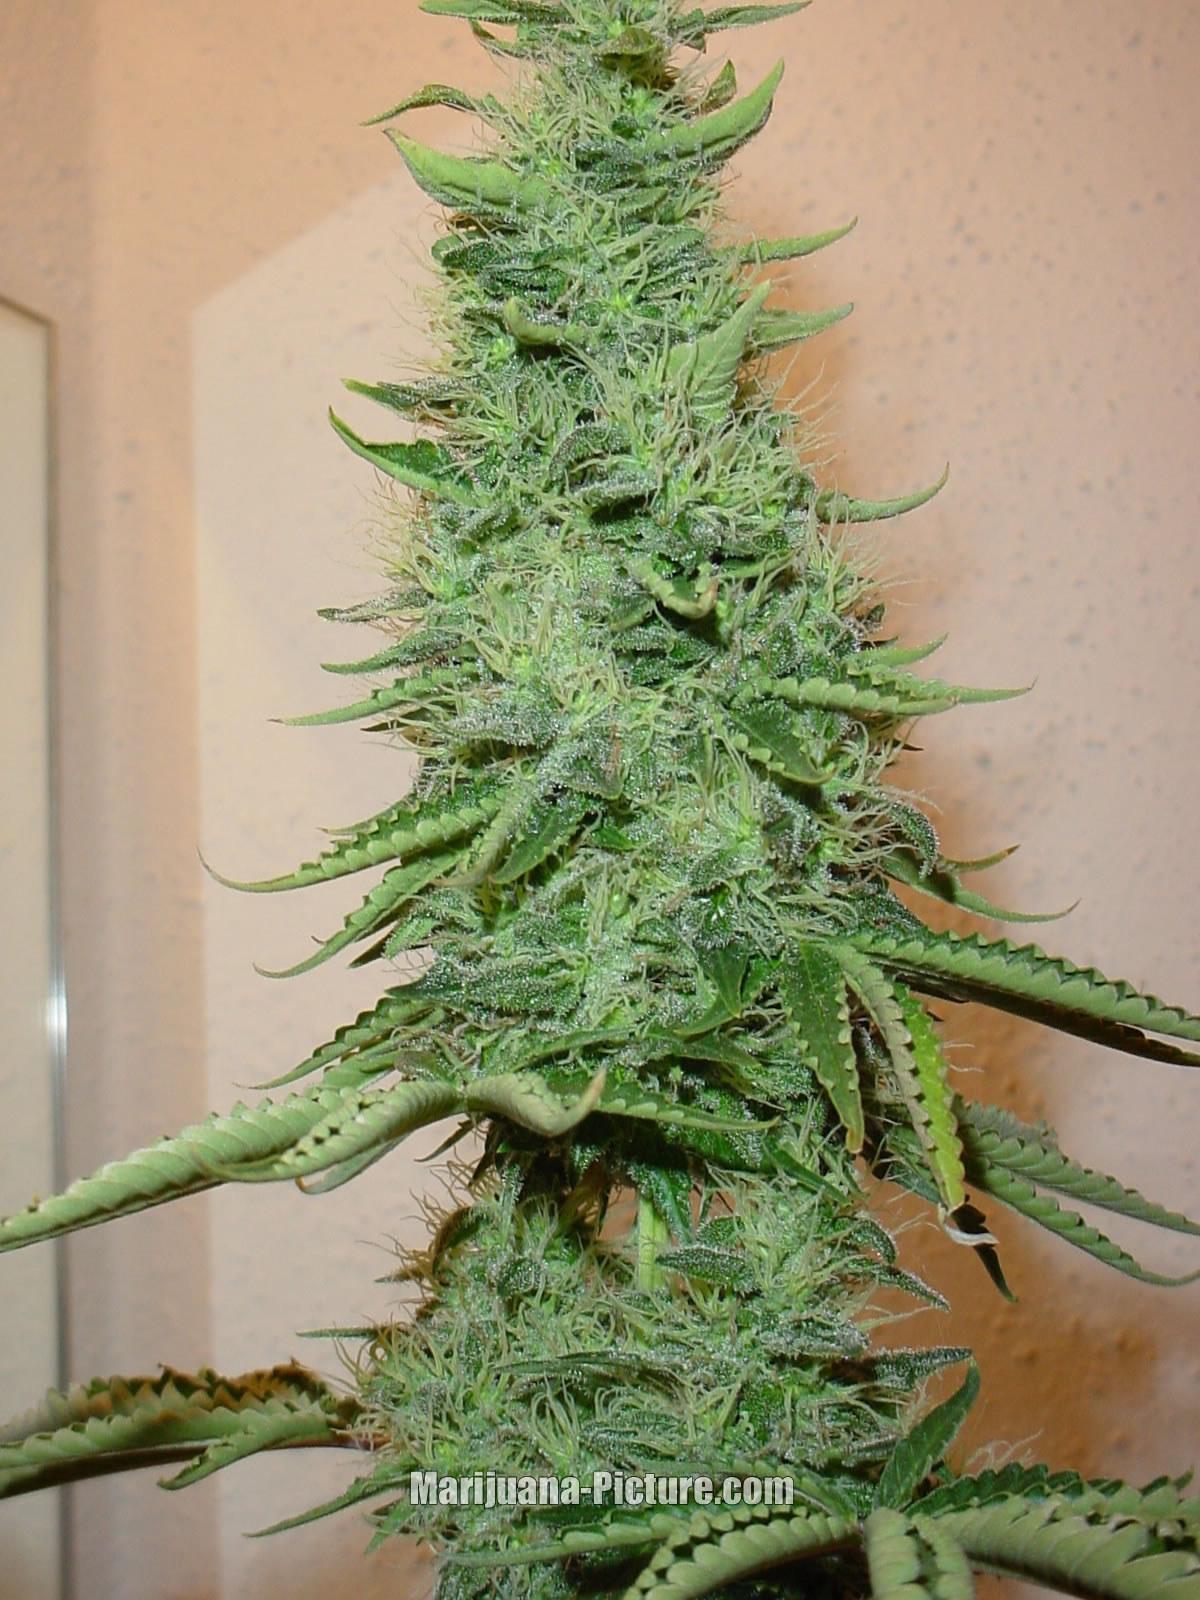 [Image: big_bud_marijuana.jpg]